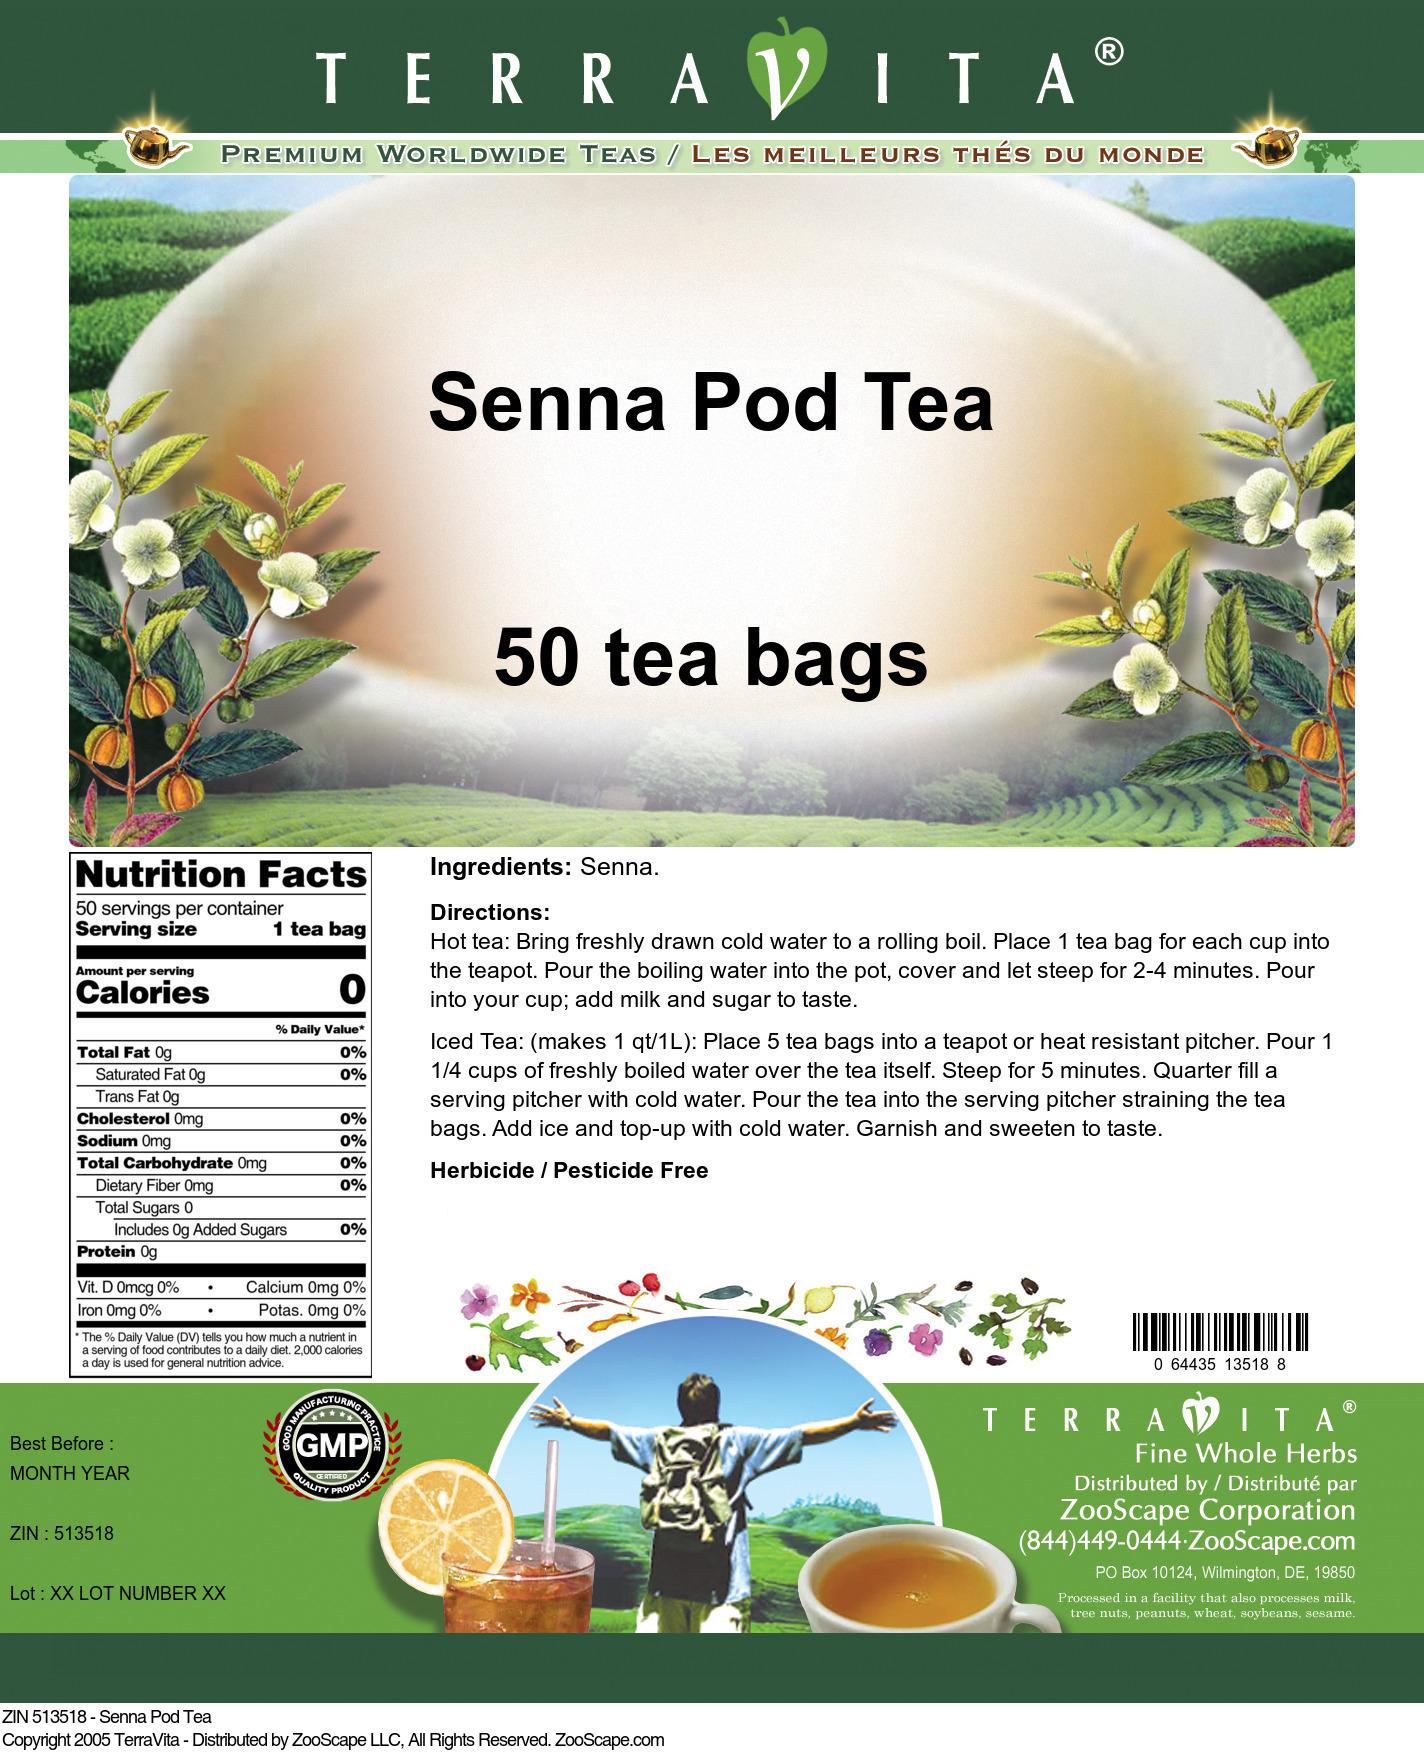 Senna Pod Tea